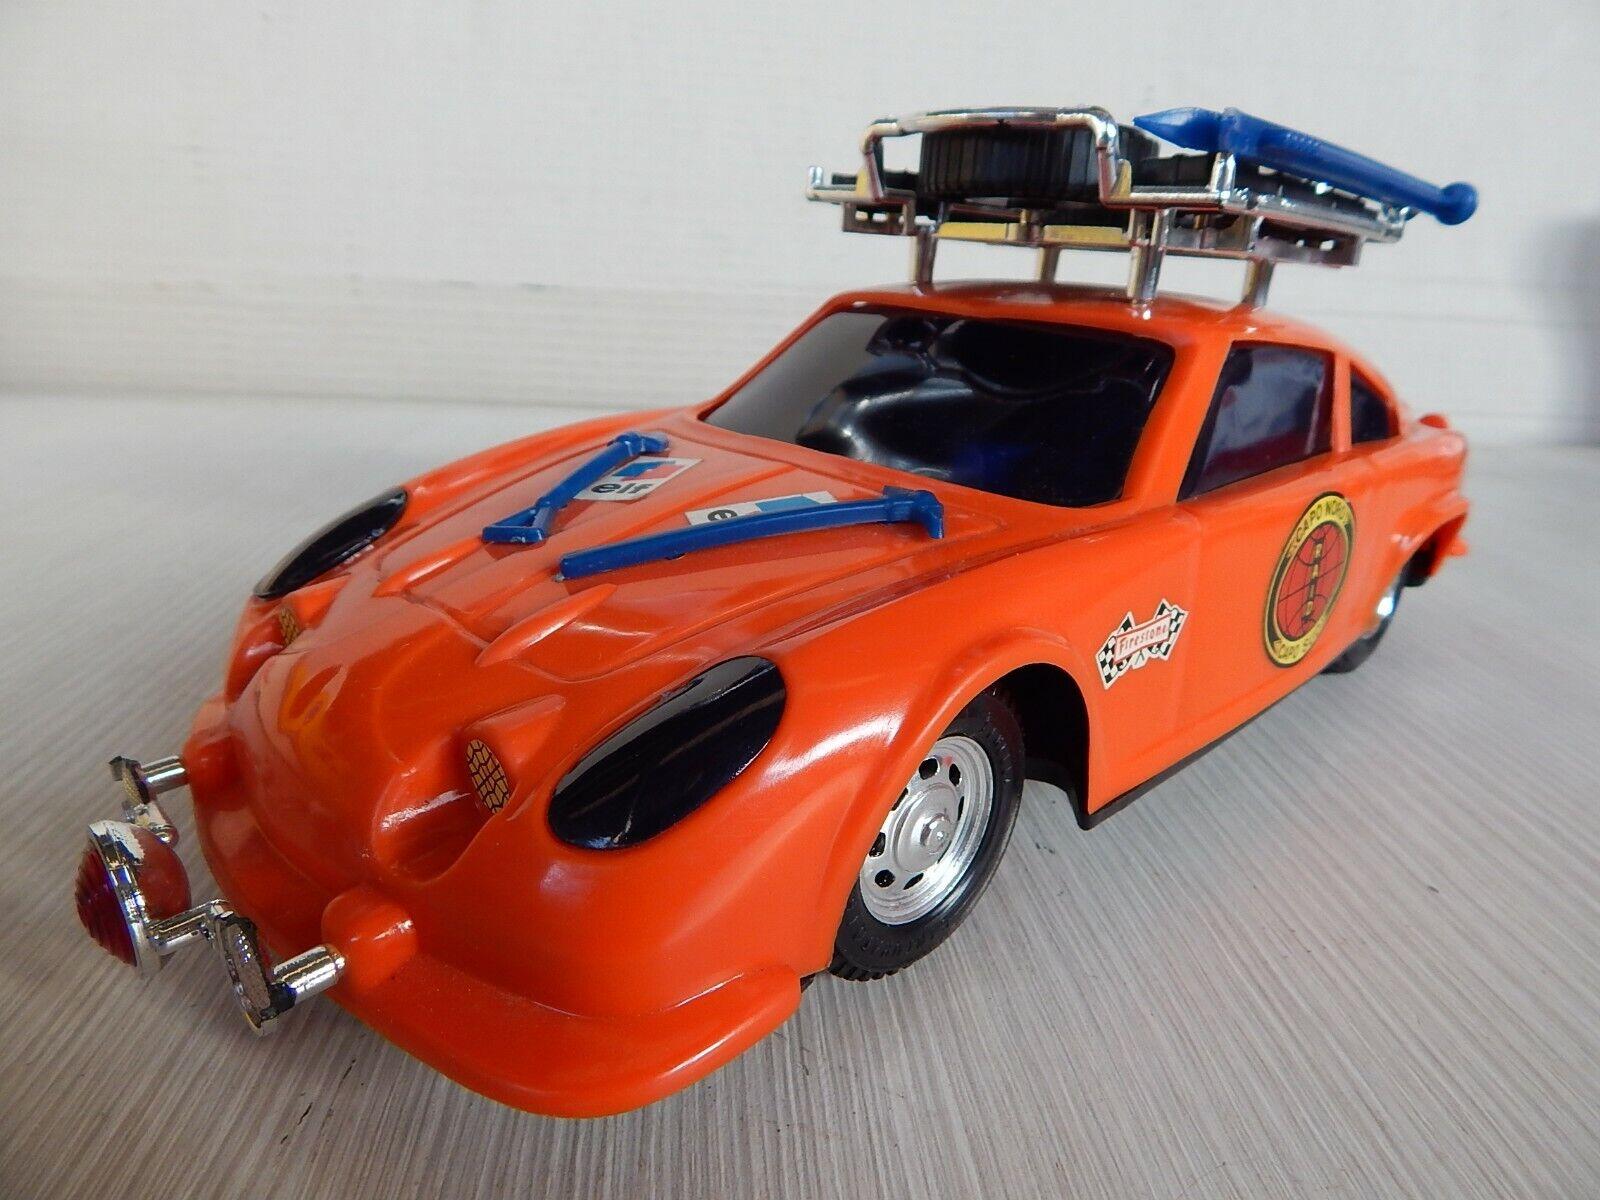 Reel Spielzeugs Jahr Renault Alpine A110 mistery Spielzeug groß scale 34 cm